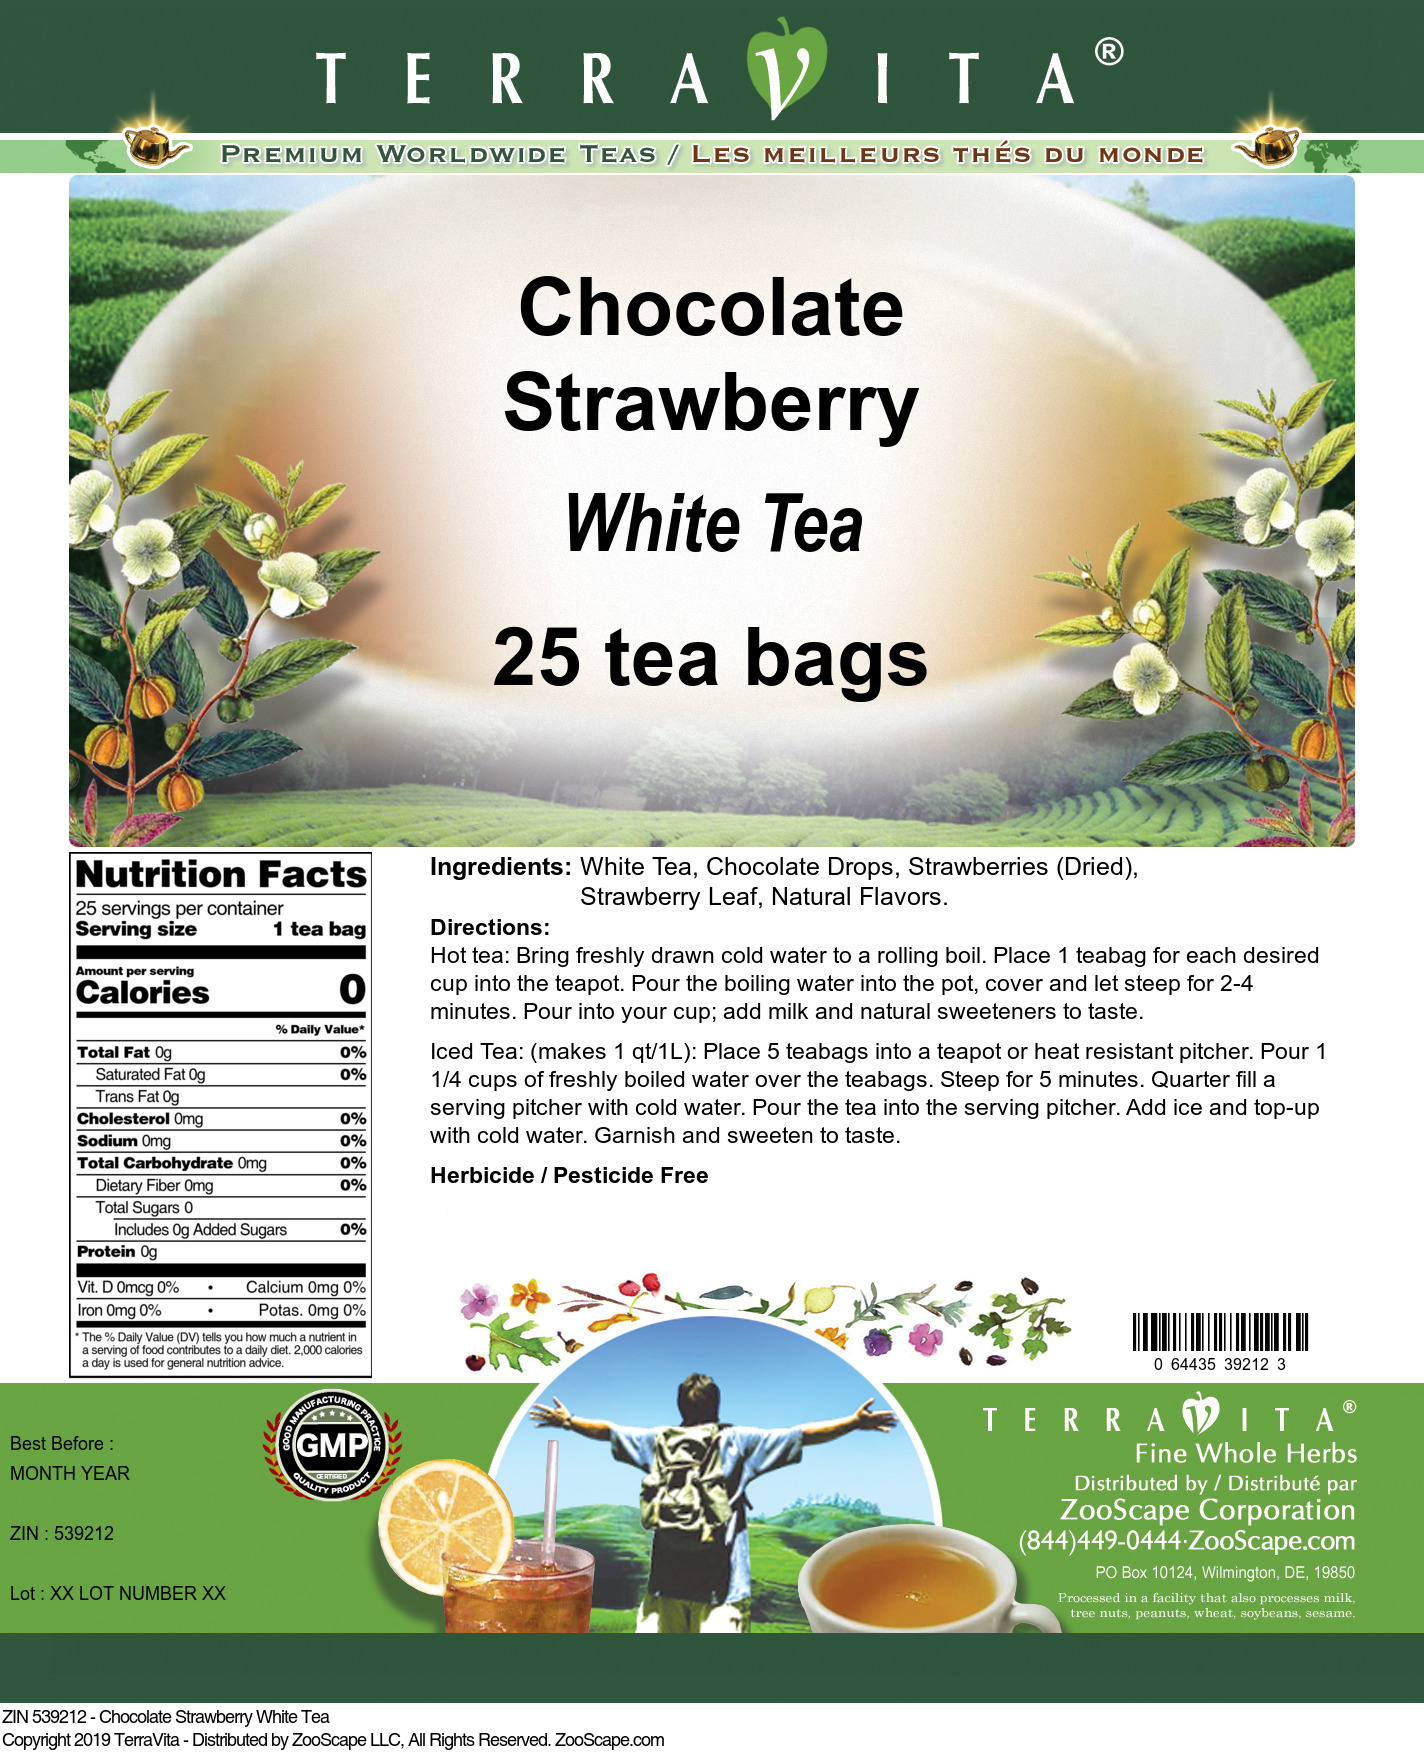 Chocolate Strawberry White Tea